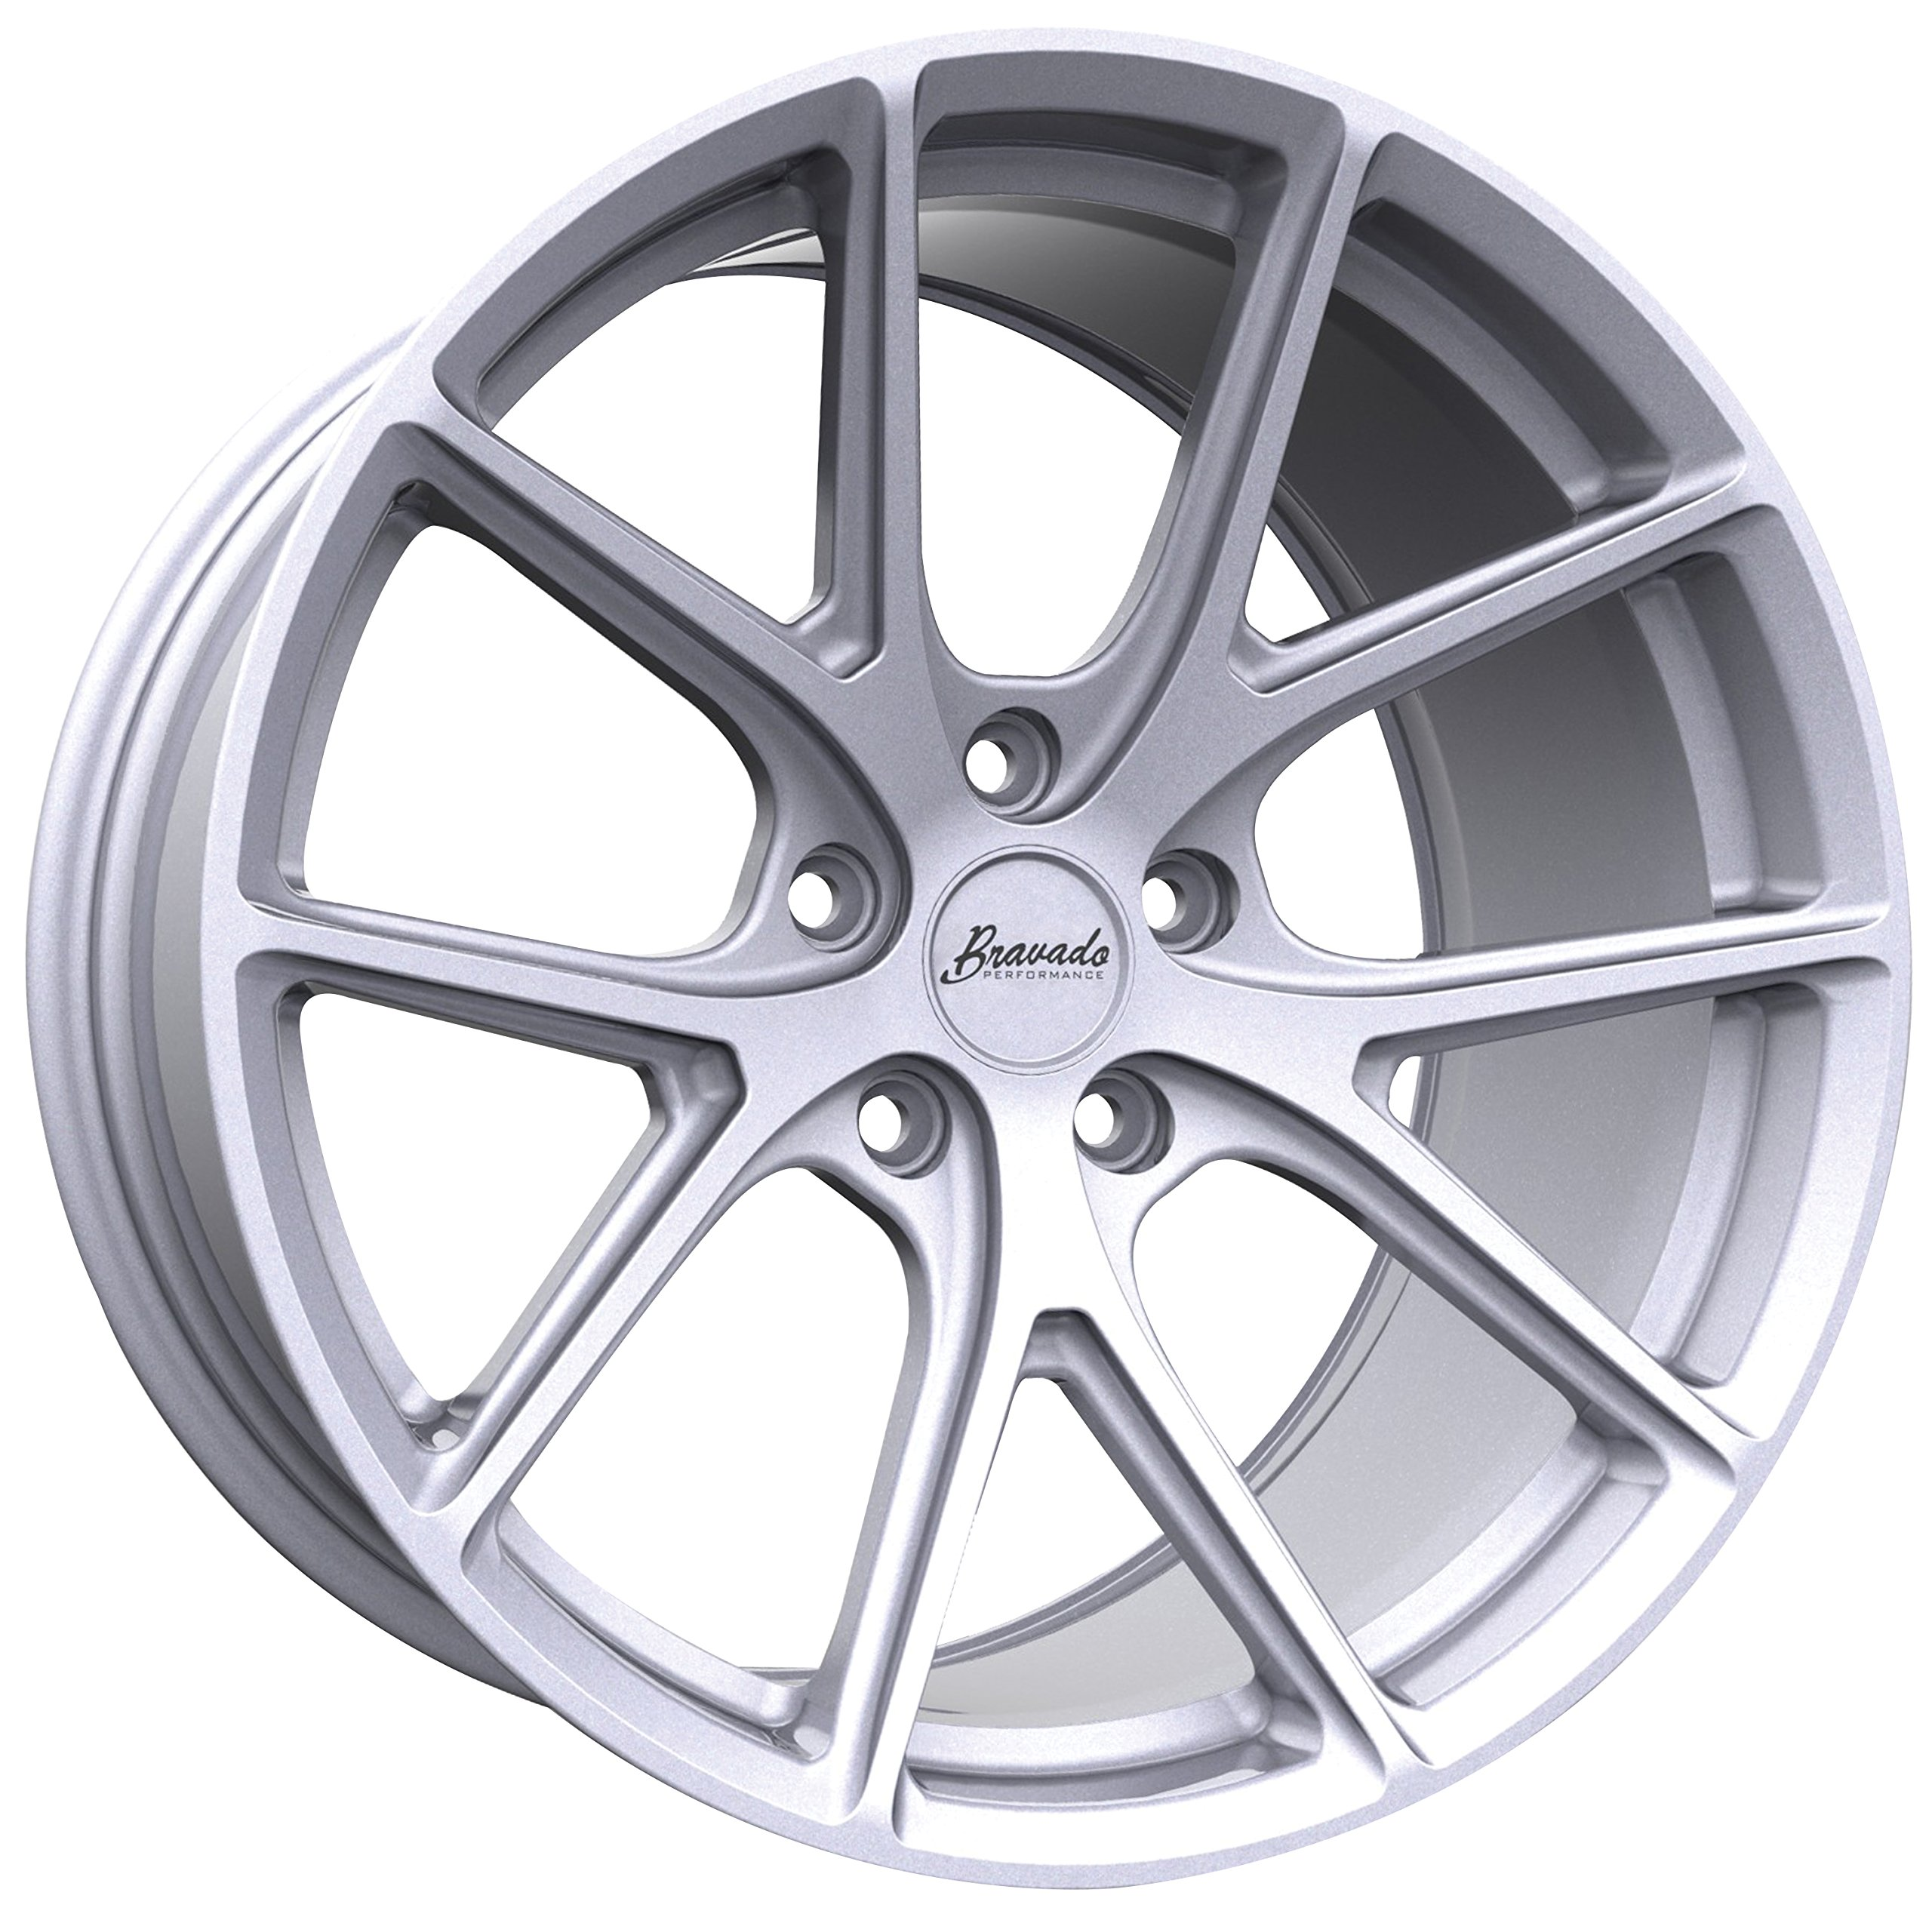 Bravado Tribute Wheel with Silver Finish (20x9.5''/5x114.3mm)